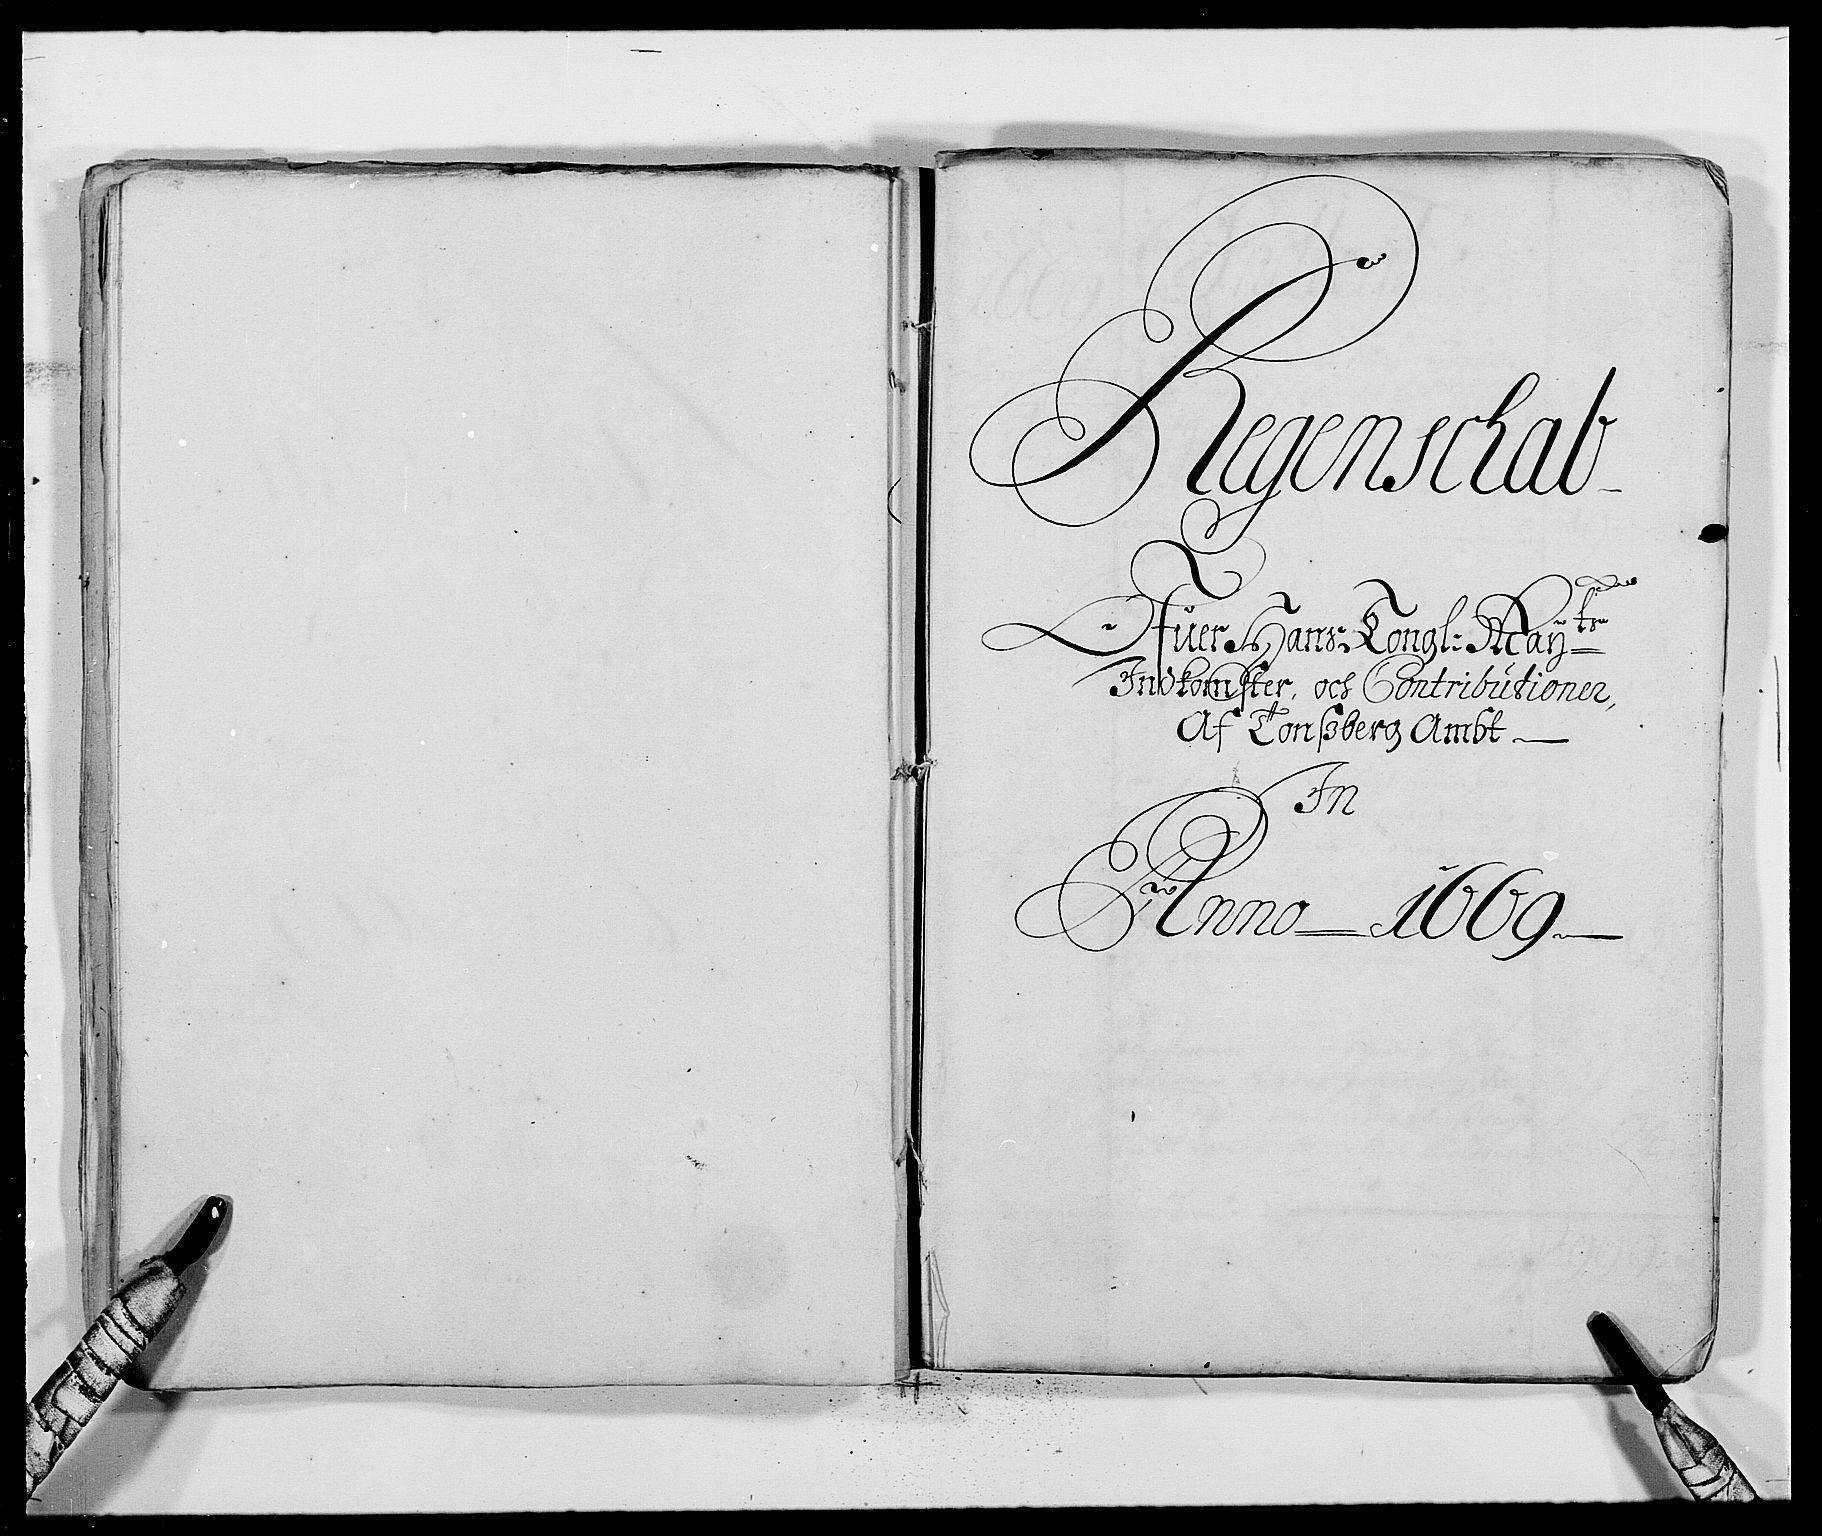 RA, Rentekammeret inntil 1814, Reviderte regnskaper, Fogderegnskap, R32/L1839: Fogderegnskap Jarlsberg grevskap, 1664-1673, s. 73